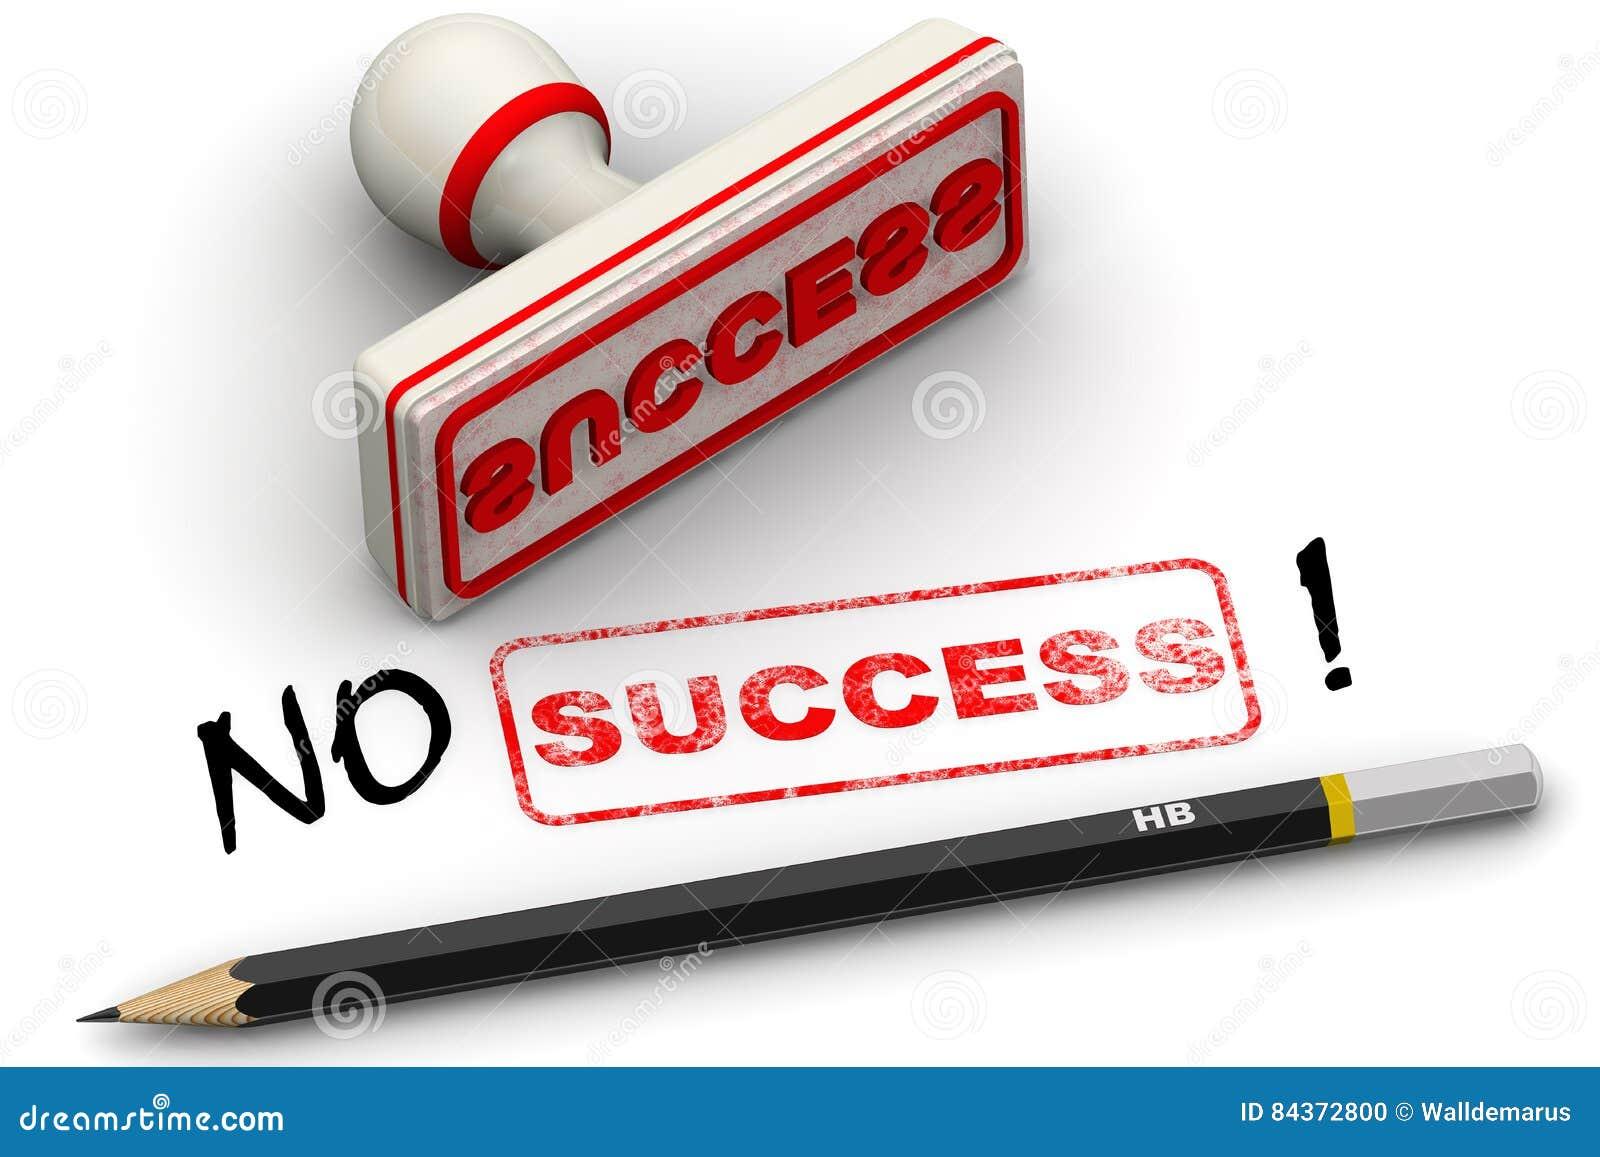 No success! Corrected seal impression